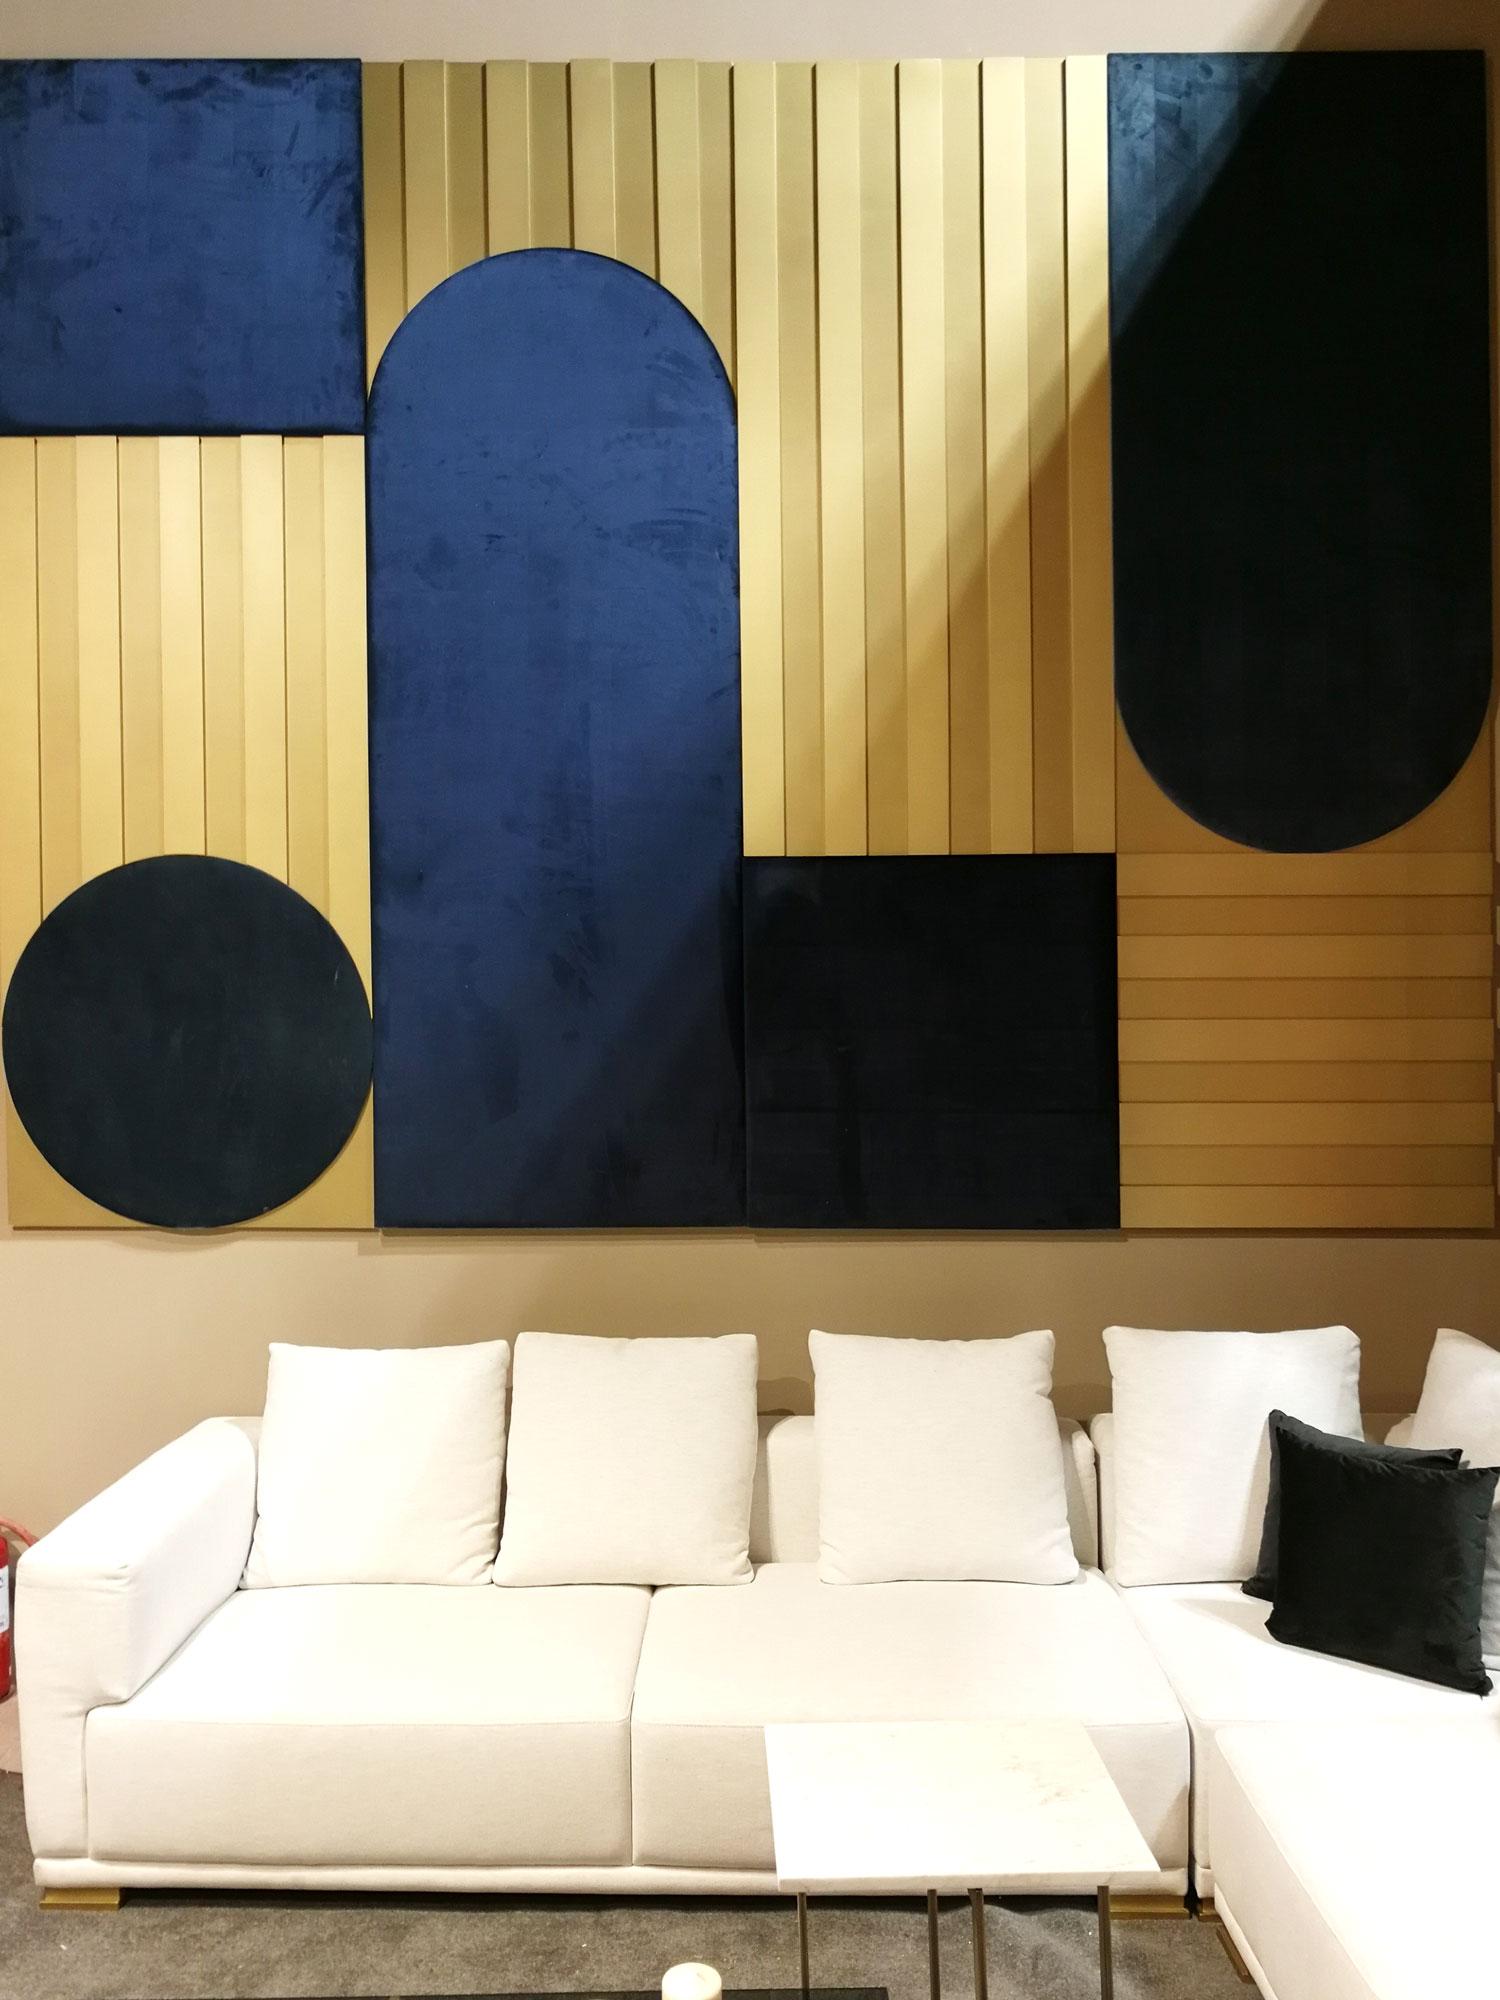 Curves and round shapes - new interior trend for 2019 and 2020 - www.AuthenticInterior.com DESIGN STUDIO & BLOG